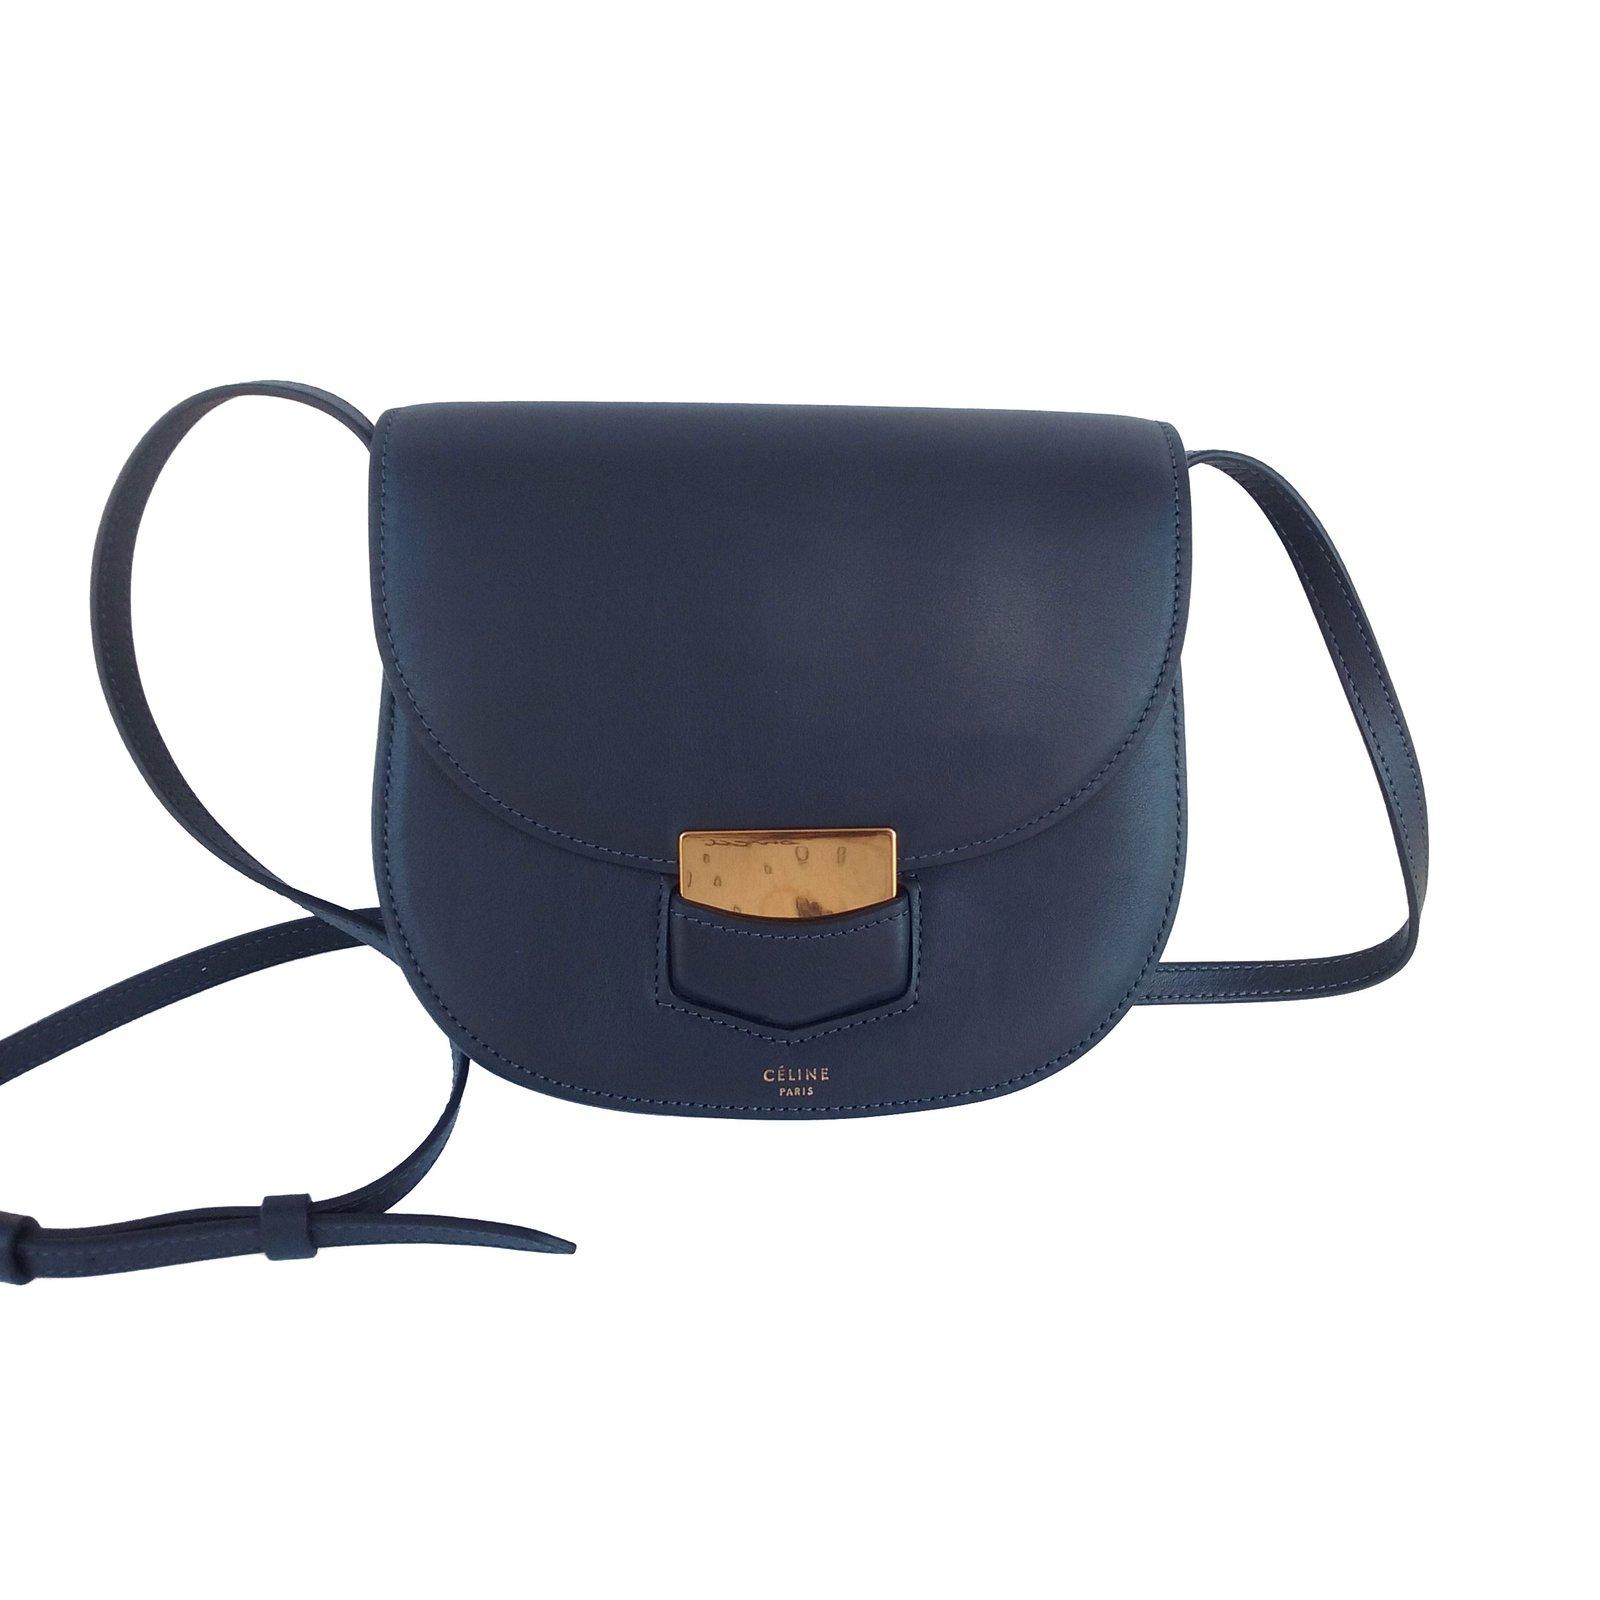 dbda047a4 Céline Trotteur Handbags Leather Blue ref.56614 - Joli Closet